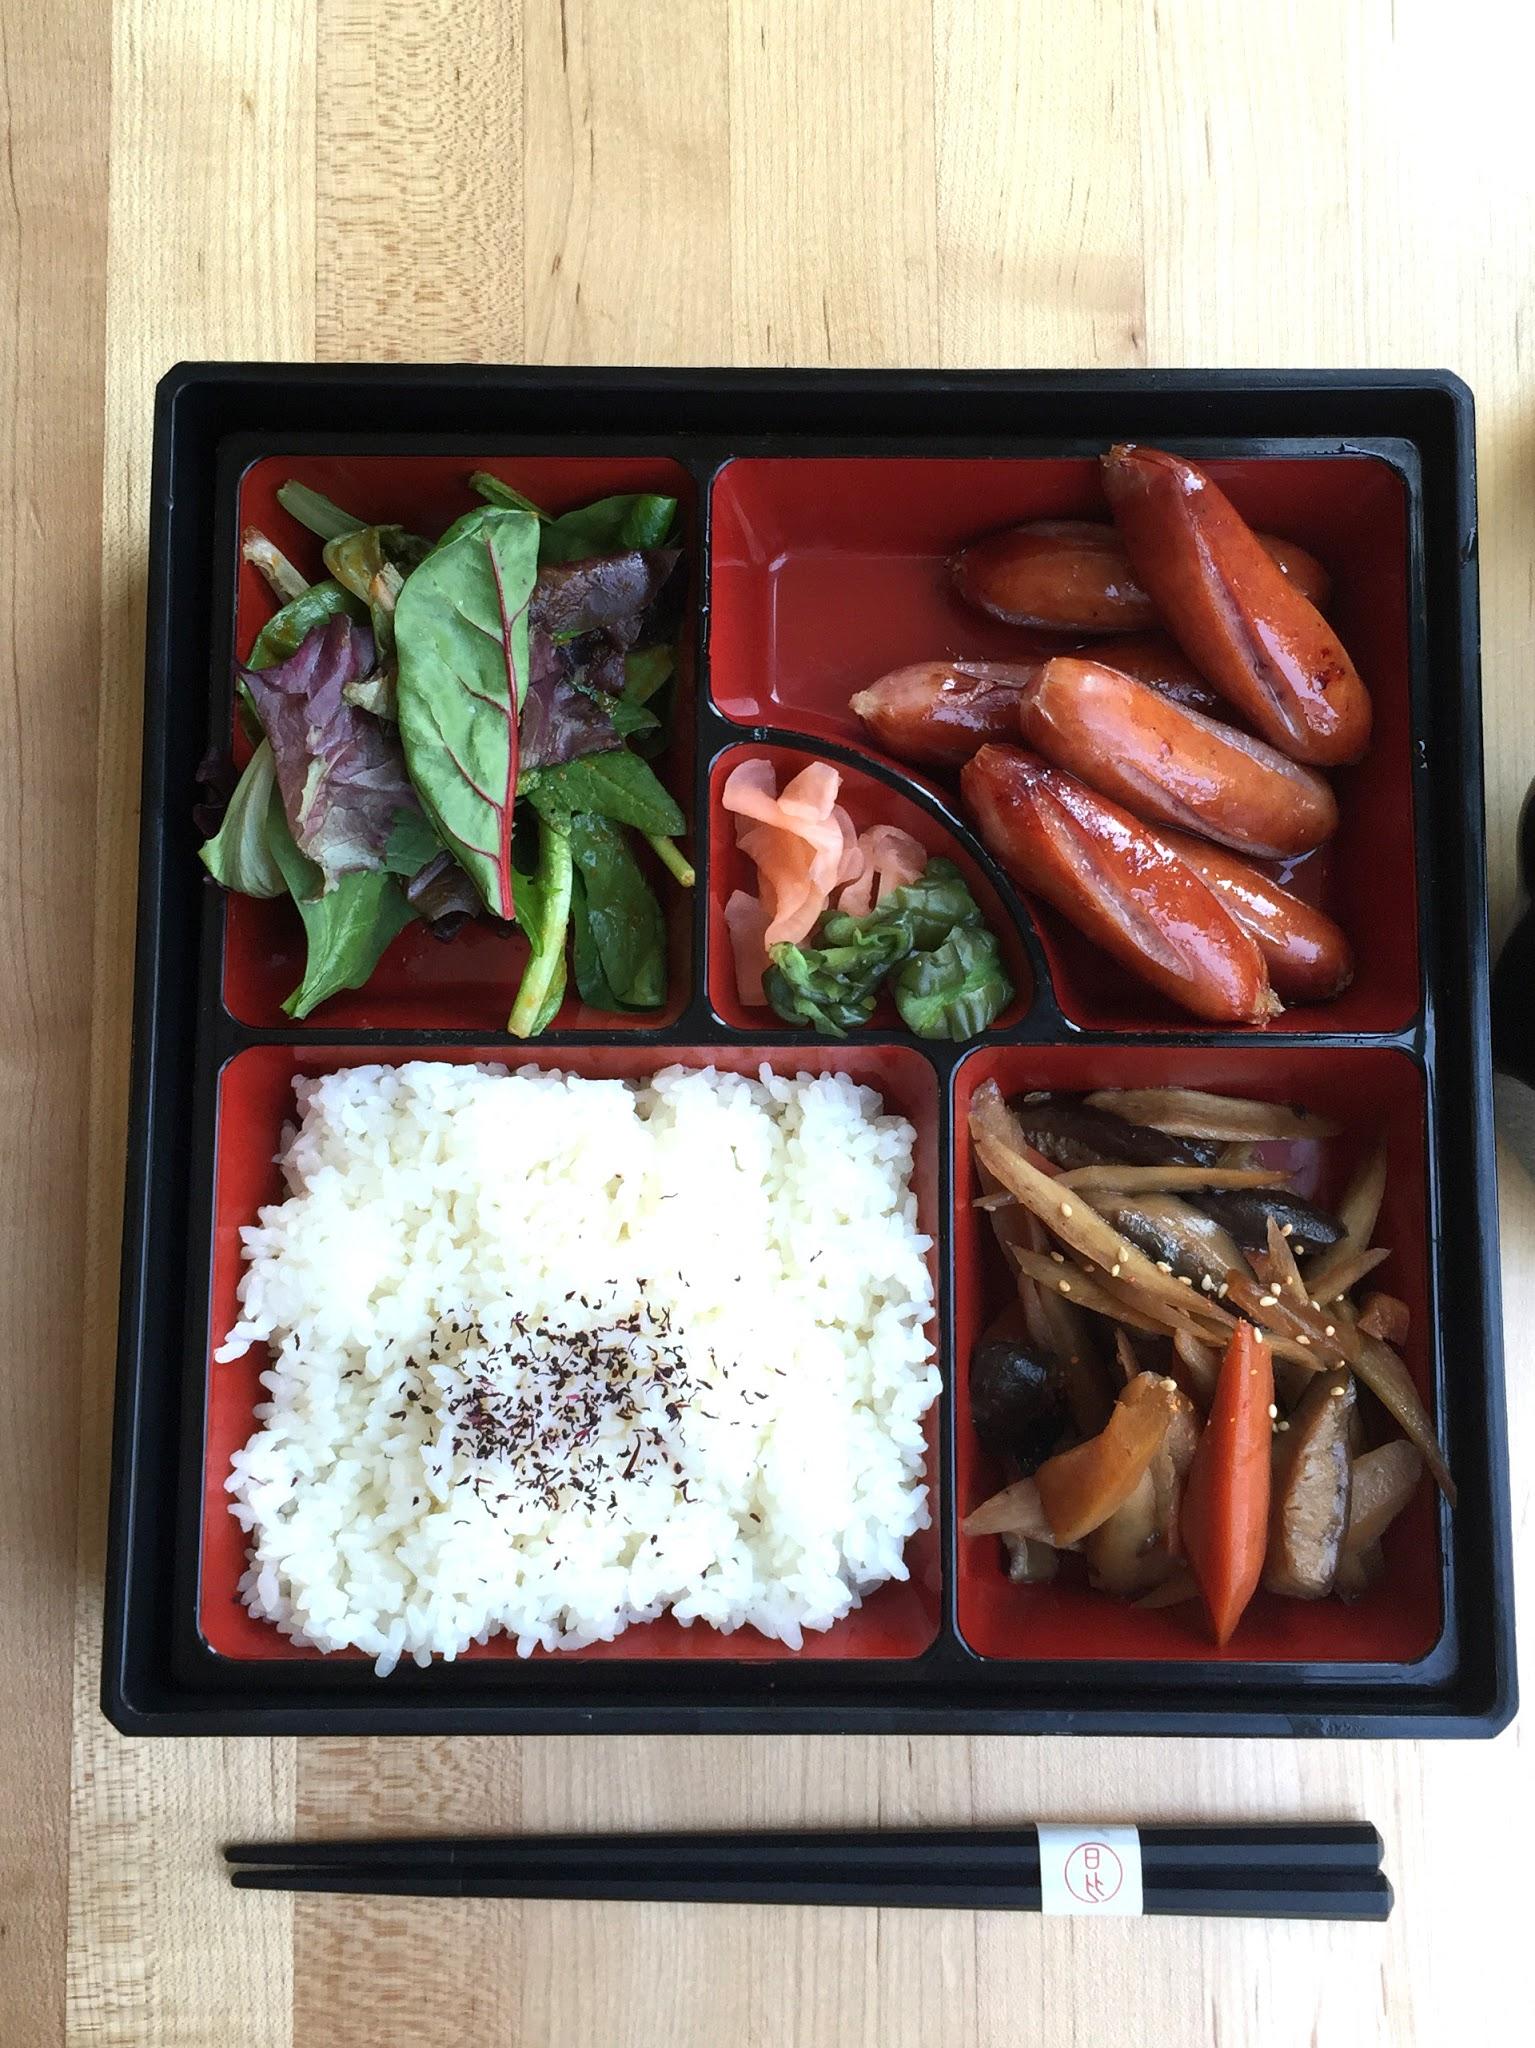 Photo: Kuro Buta Sausage - Grilled Pork Sausage  http://lunchbox.hibino-lic.com